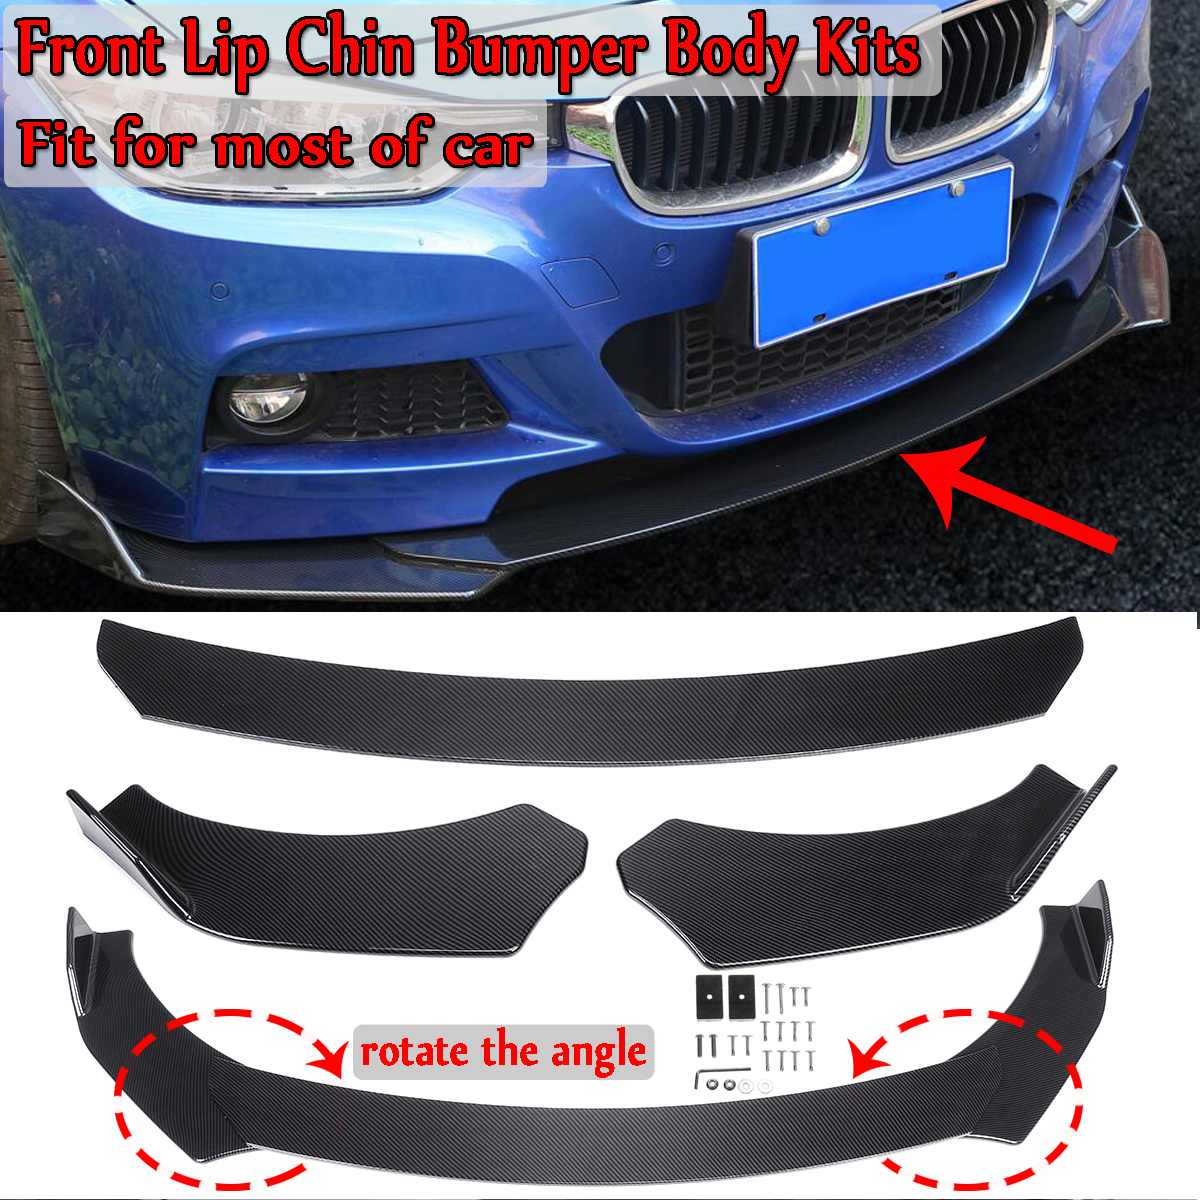 3 Piece Universal Car Front Lip Chin Bumper Splitter Diffuser Spoiler Body Kits For Honda For Audi For Benz For Bmw For Subaru Aliexpress